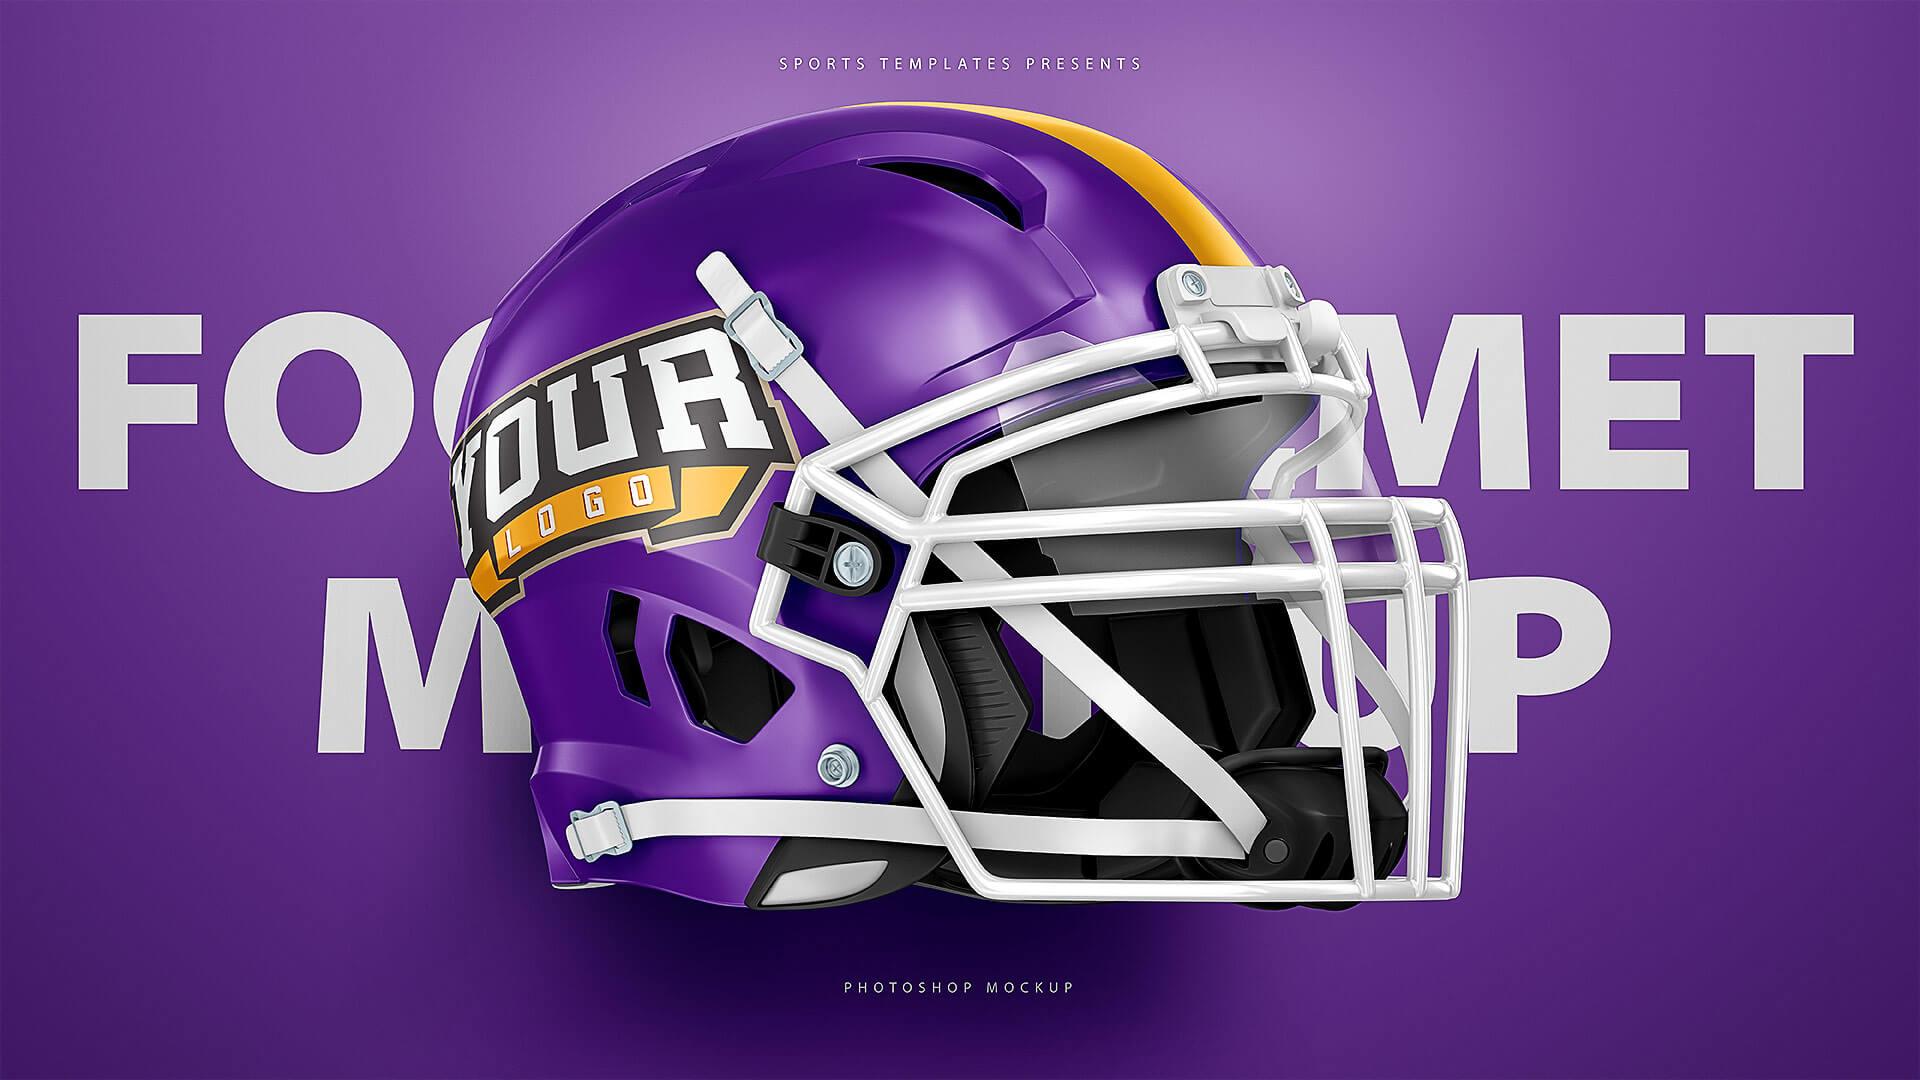 schutt vengeance z10 helmet 3 views mockup sports templates